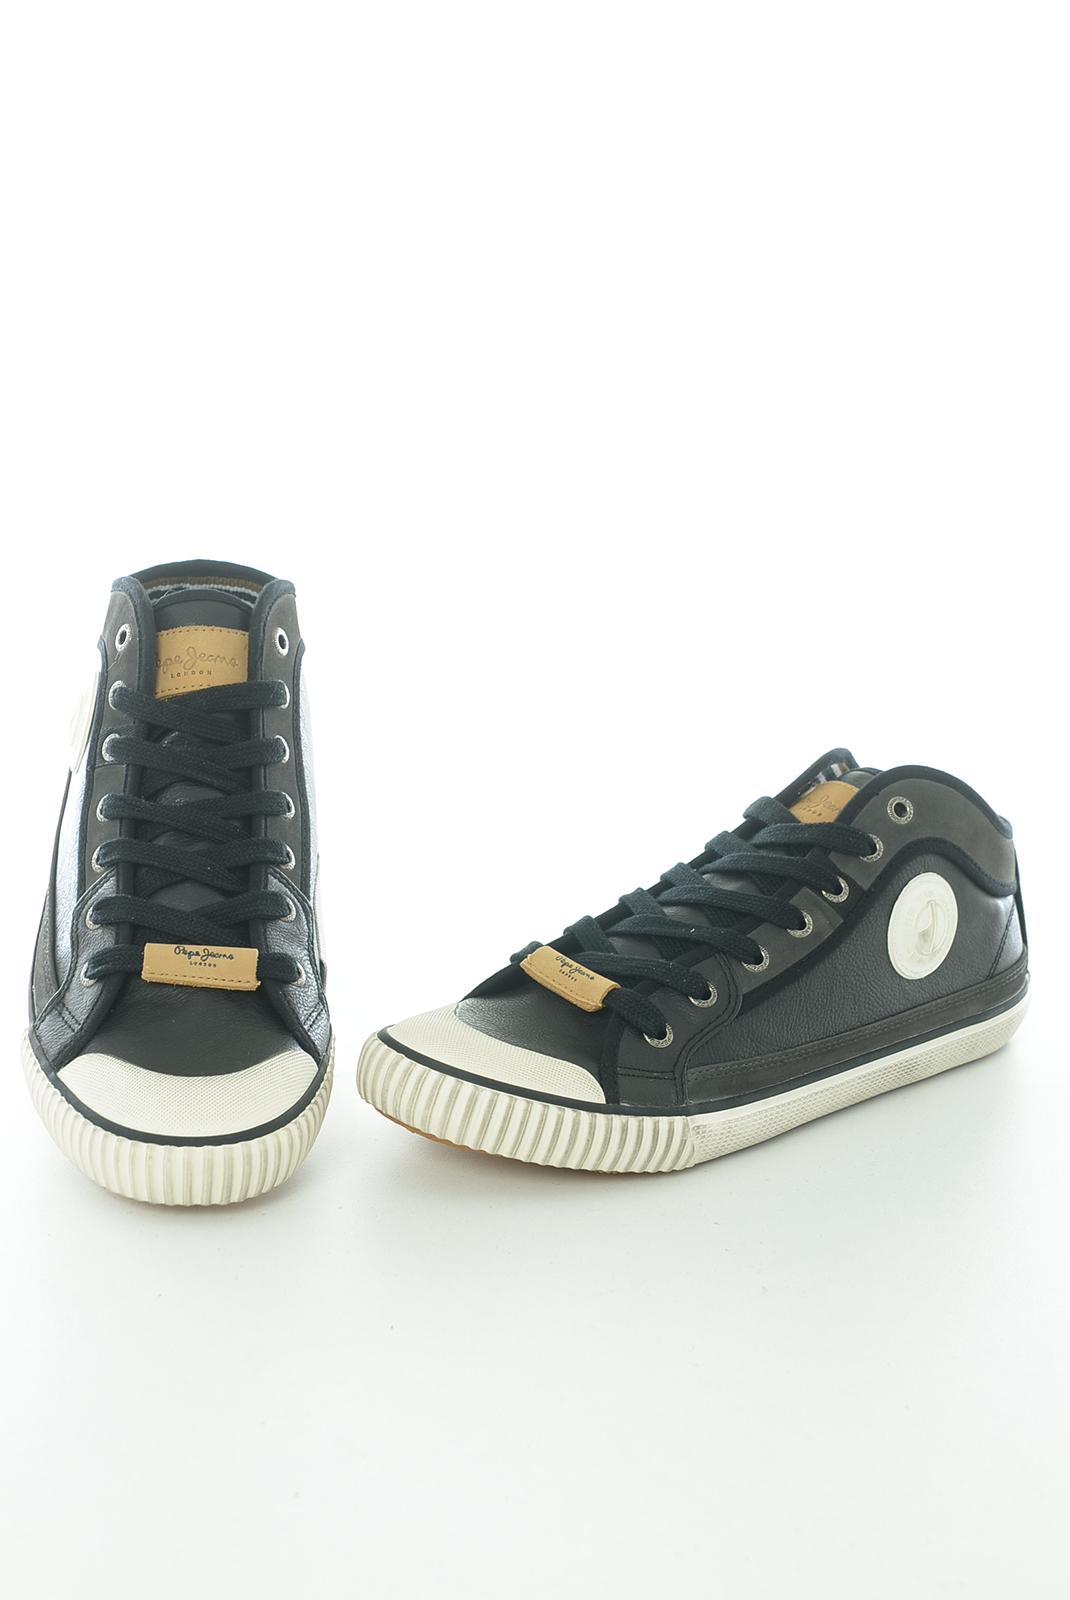 Reduc Sport Shoes